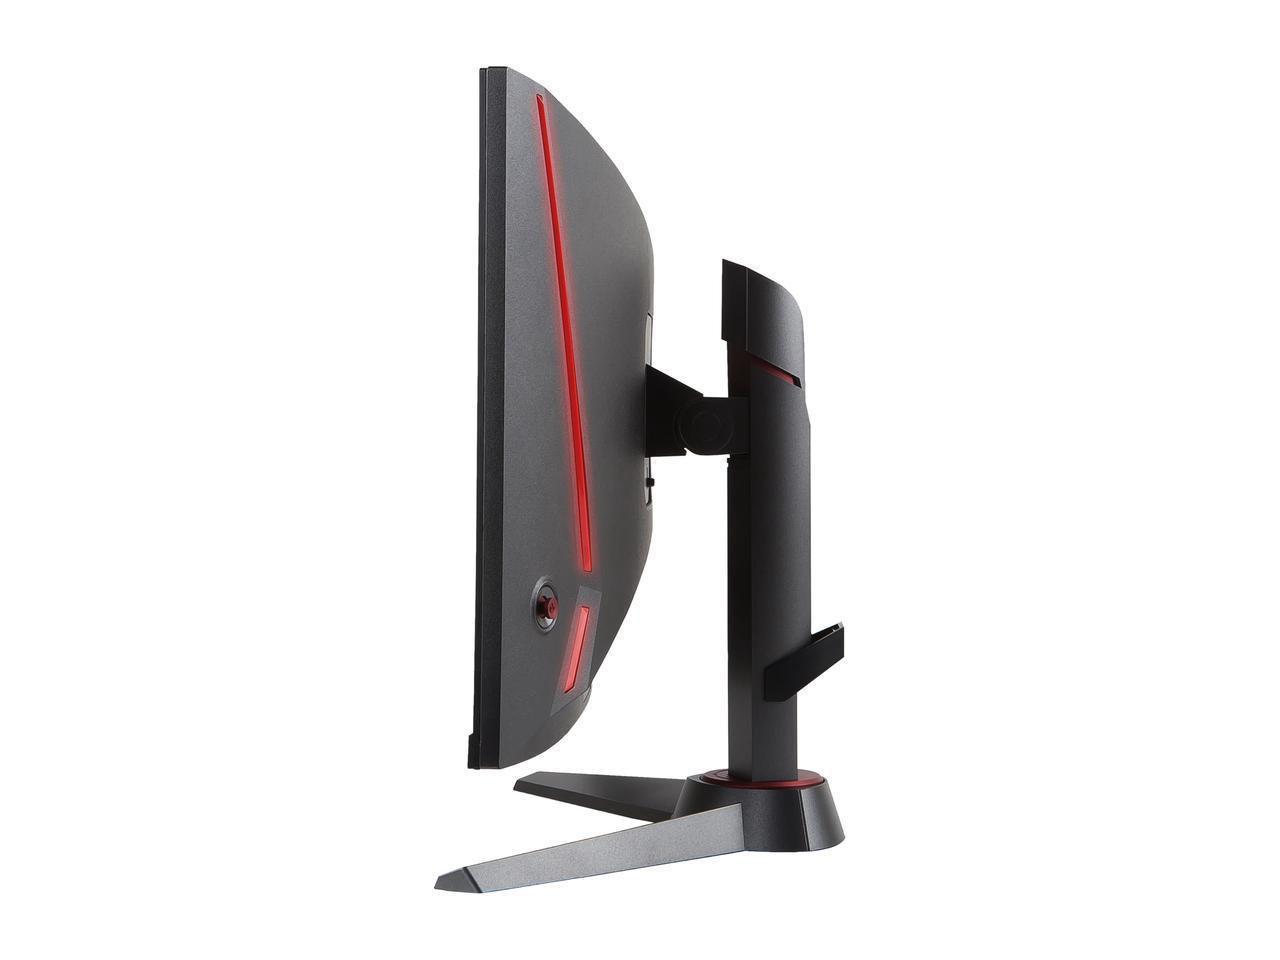 MSI Optix MAG24C 144 Curved FHD 1080p 1ms (MPRT) 144Hz Widescreen LED